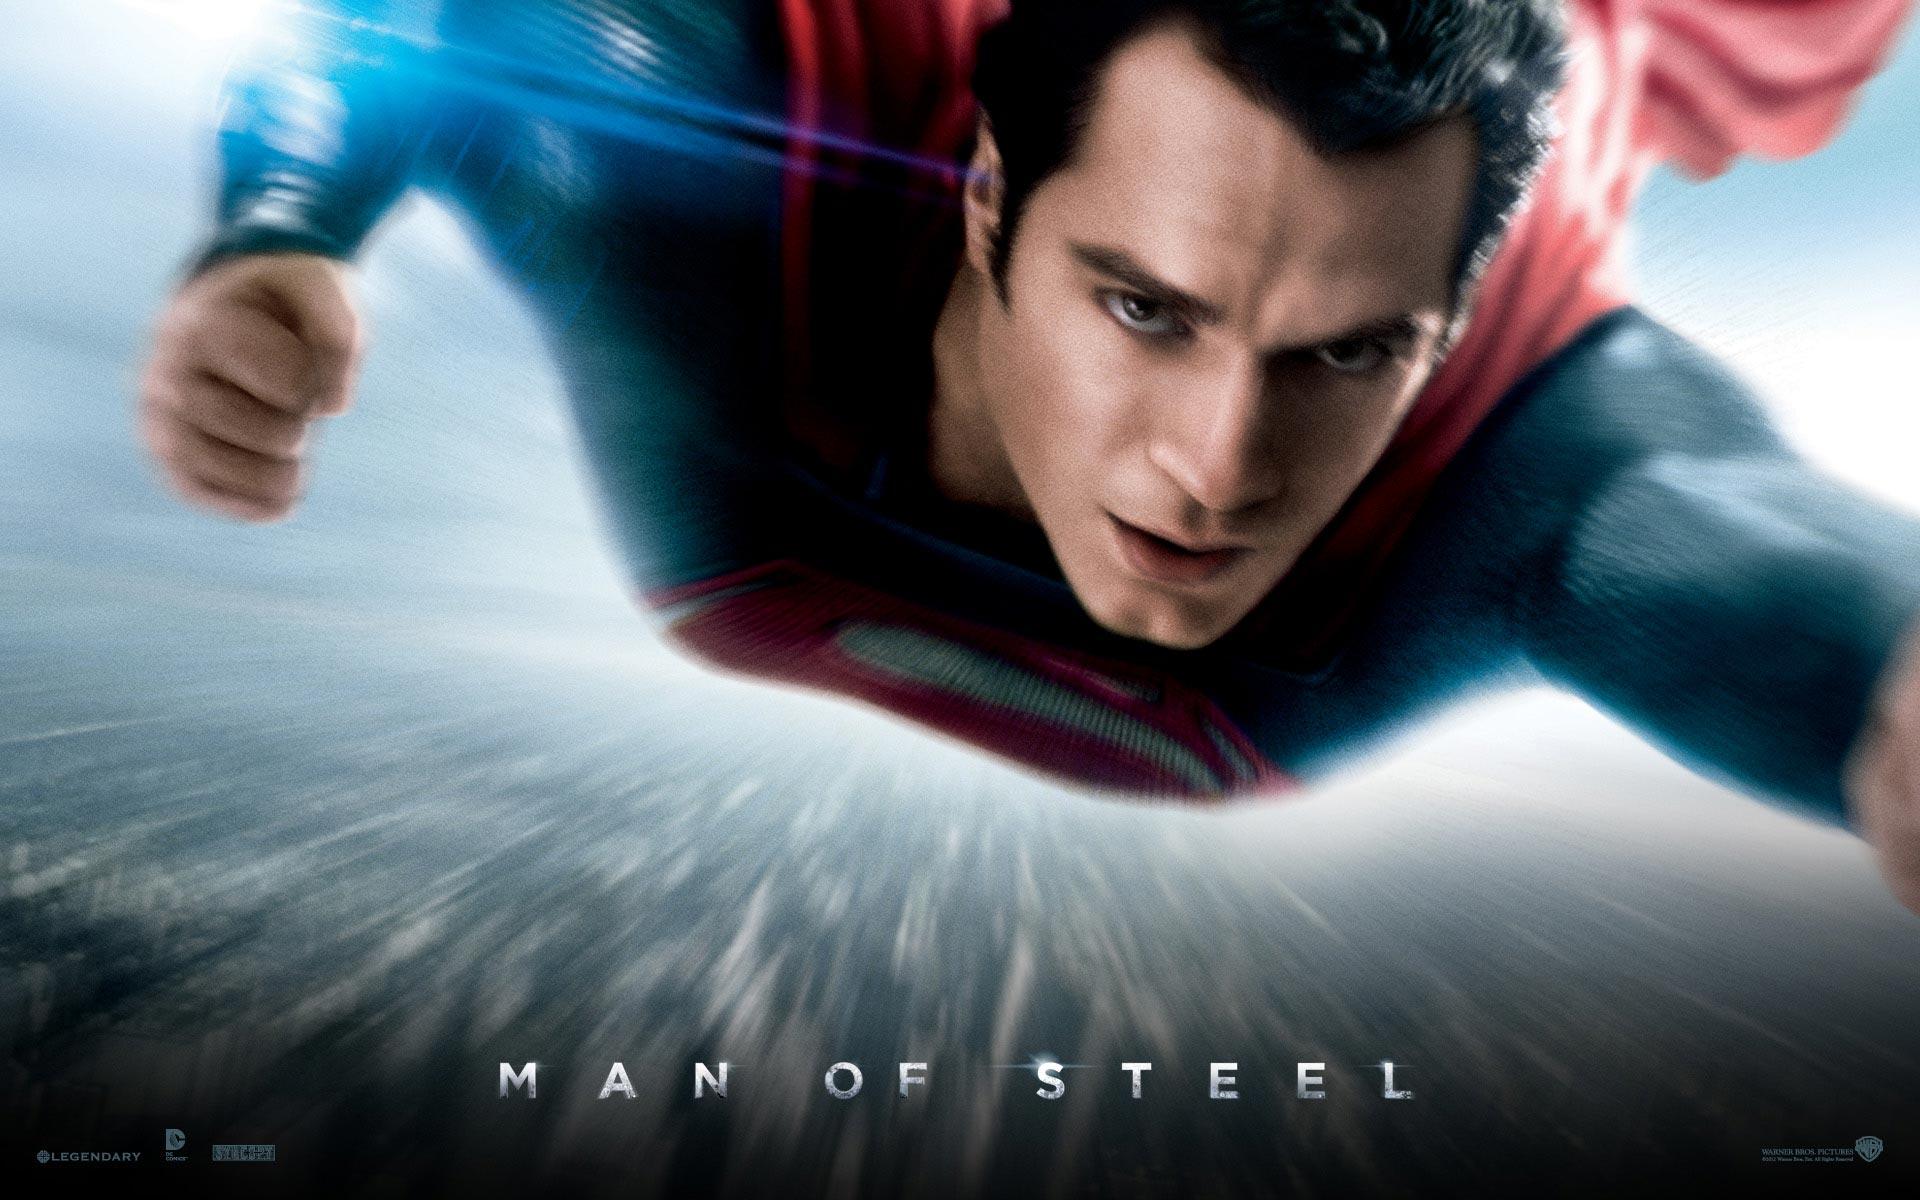 Man of steel cast and crew screening report